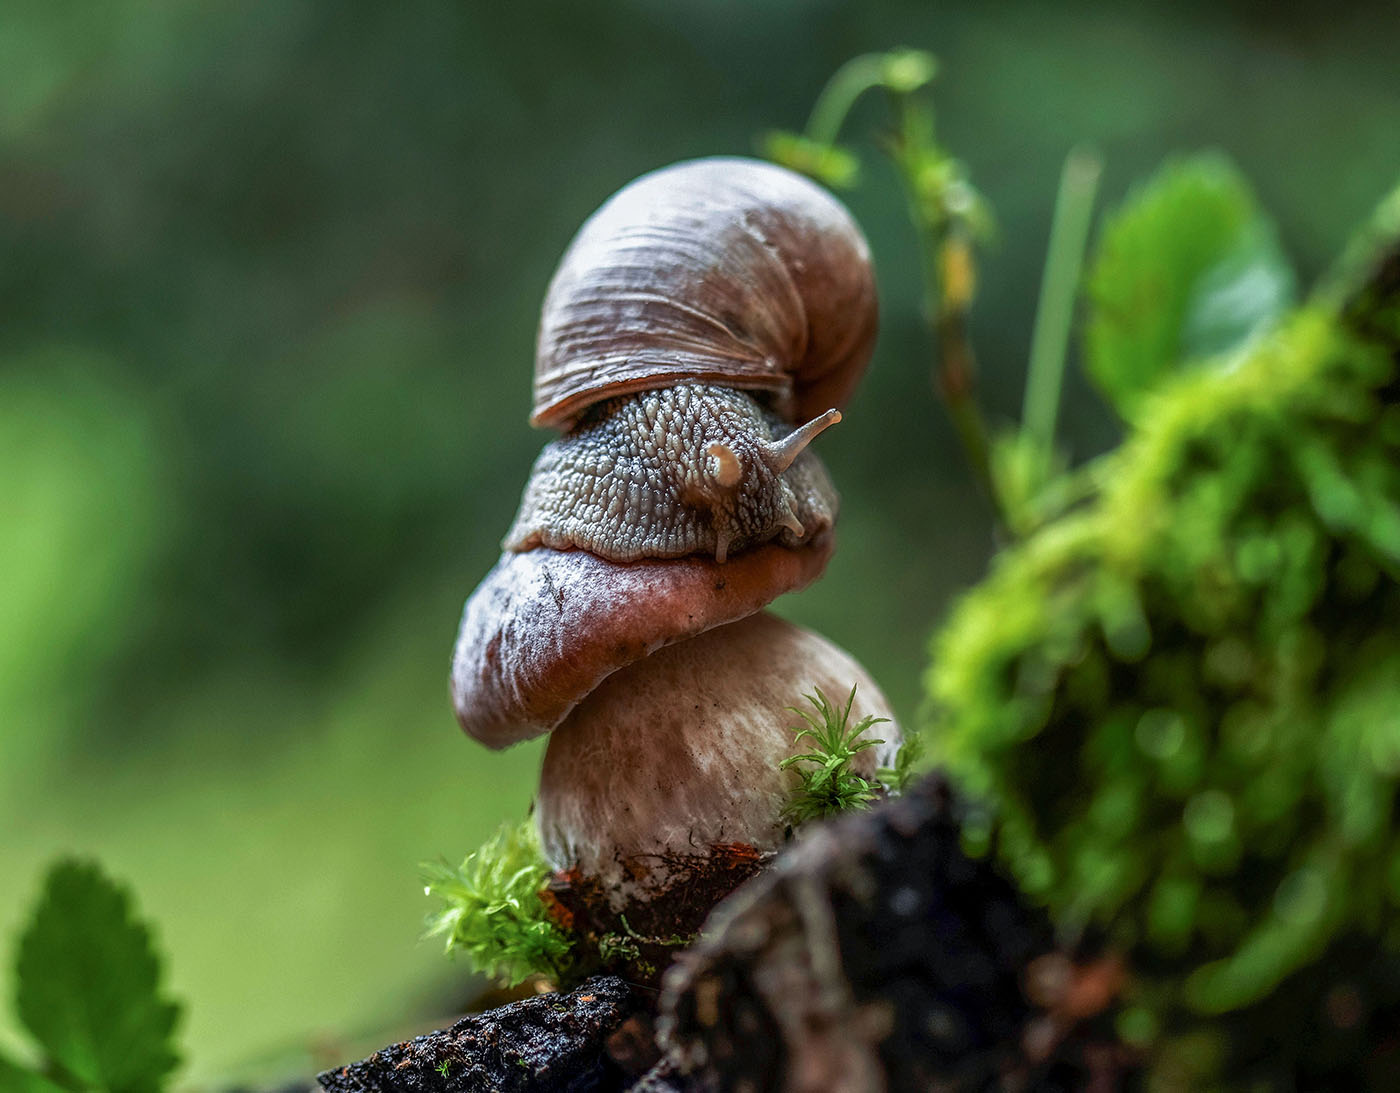 улитка,тихоход, моллюск,гриб, белый,природа, snail, boletus, nature, Стукалова Юлия